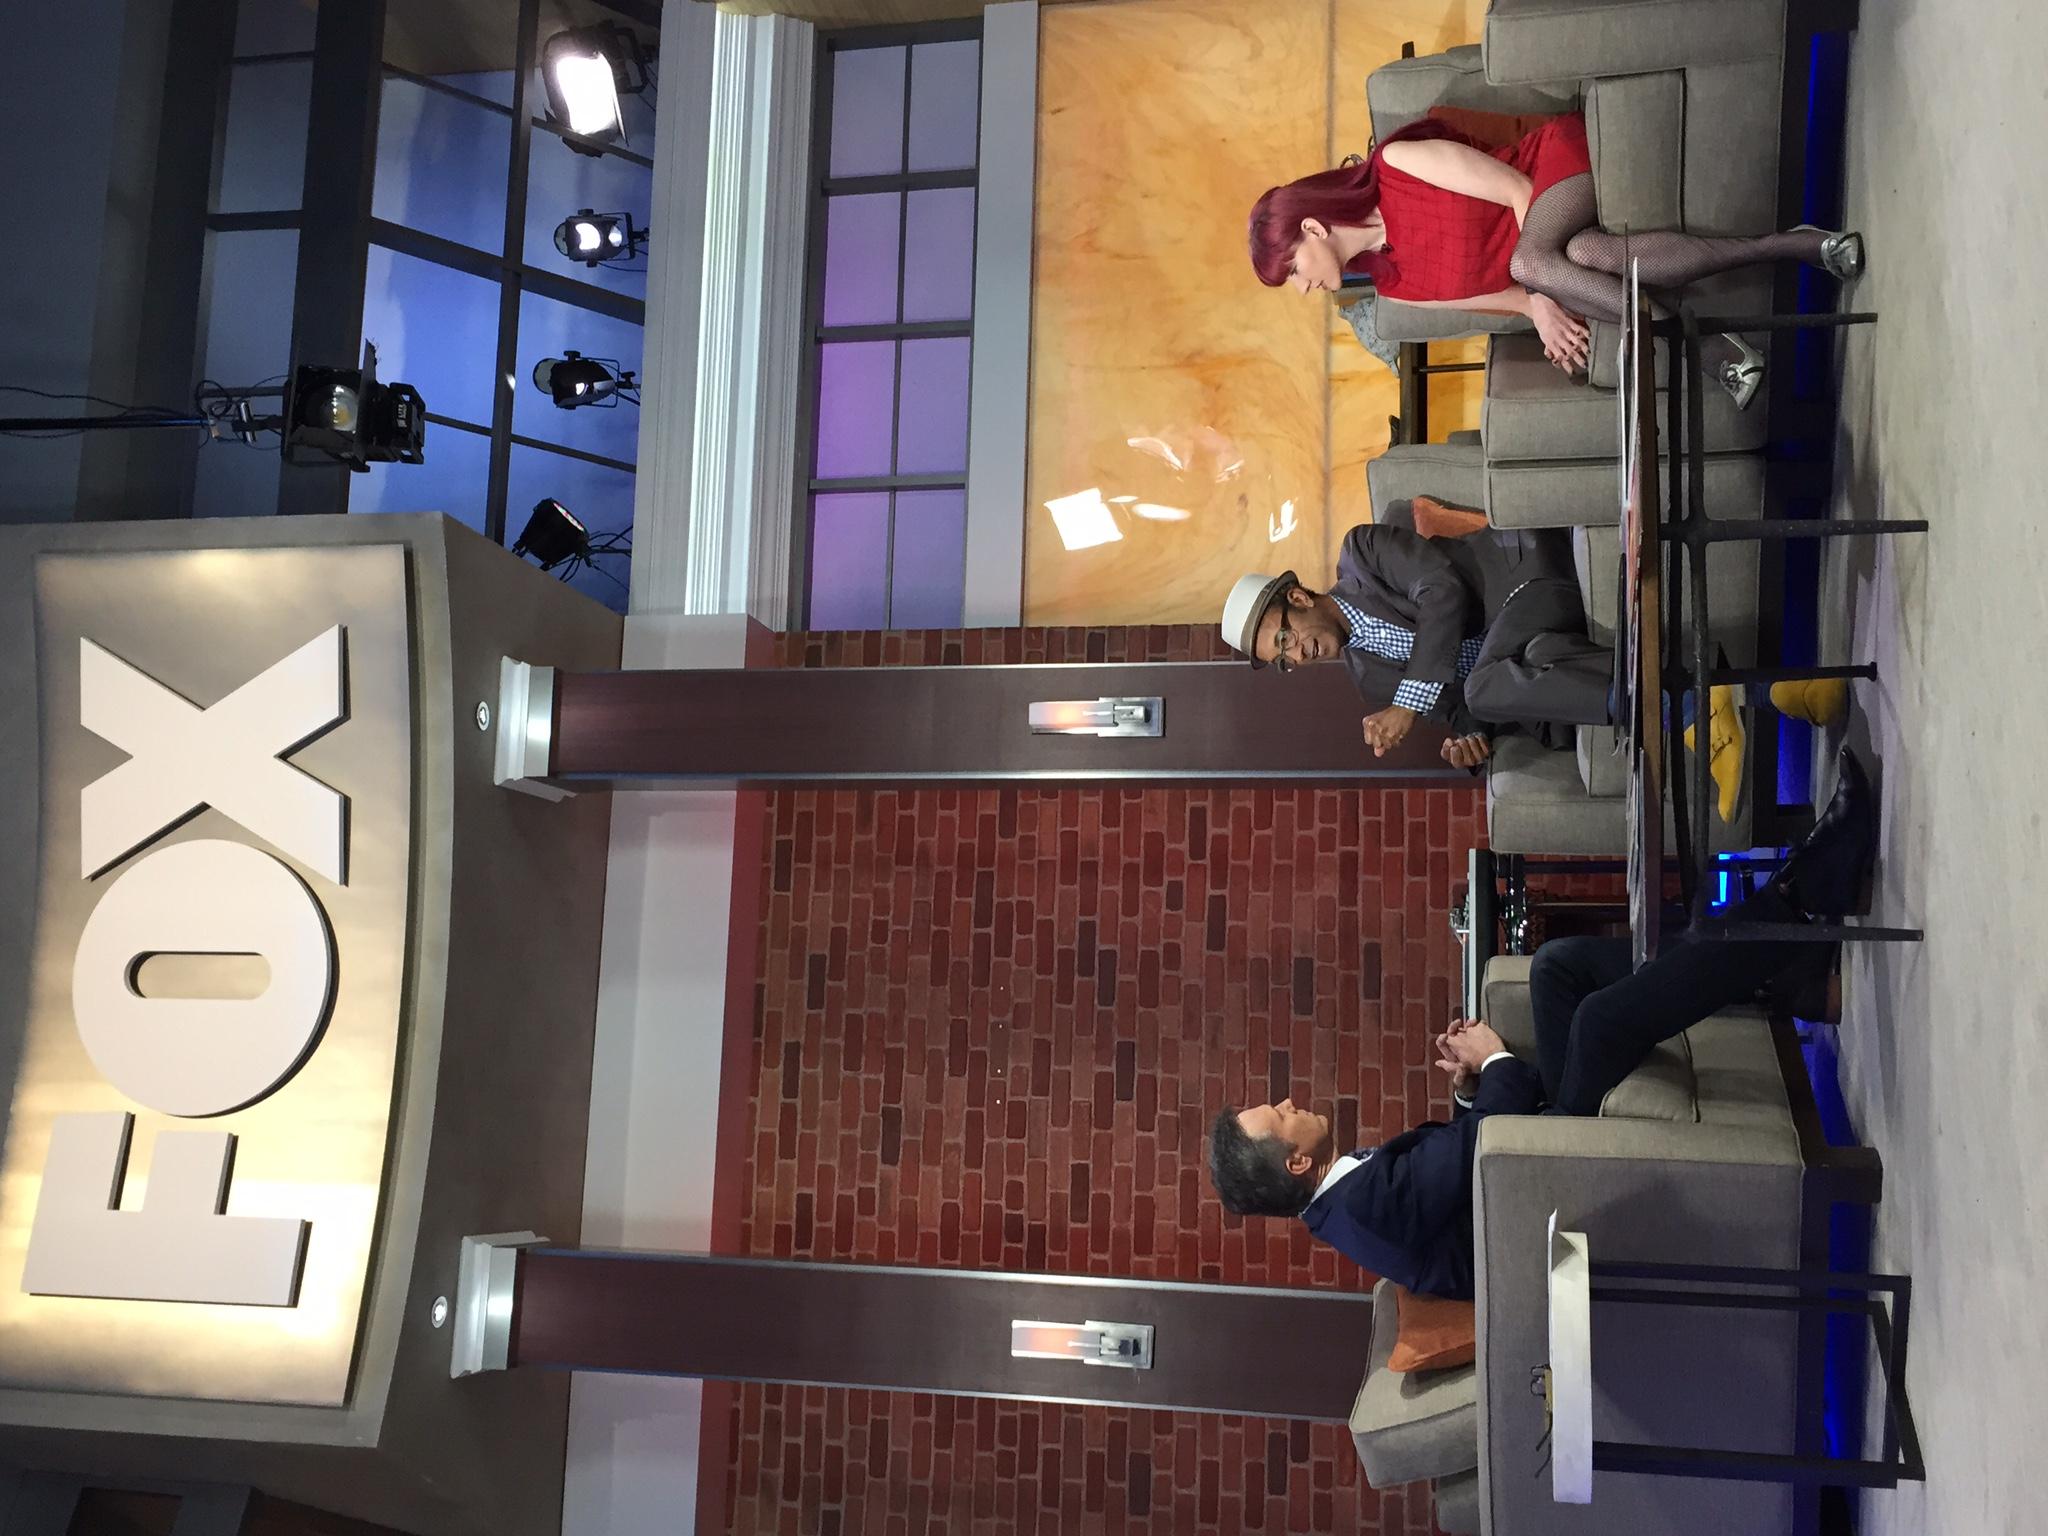 (l-r)Fox11 anchor Jeff Michael, Shawn, Yahoo! Music managing editor Lyndsey Parker